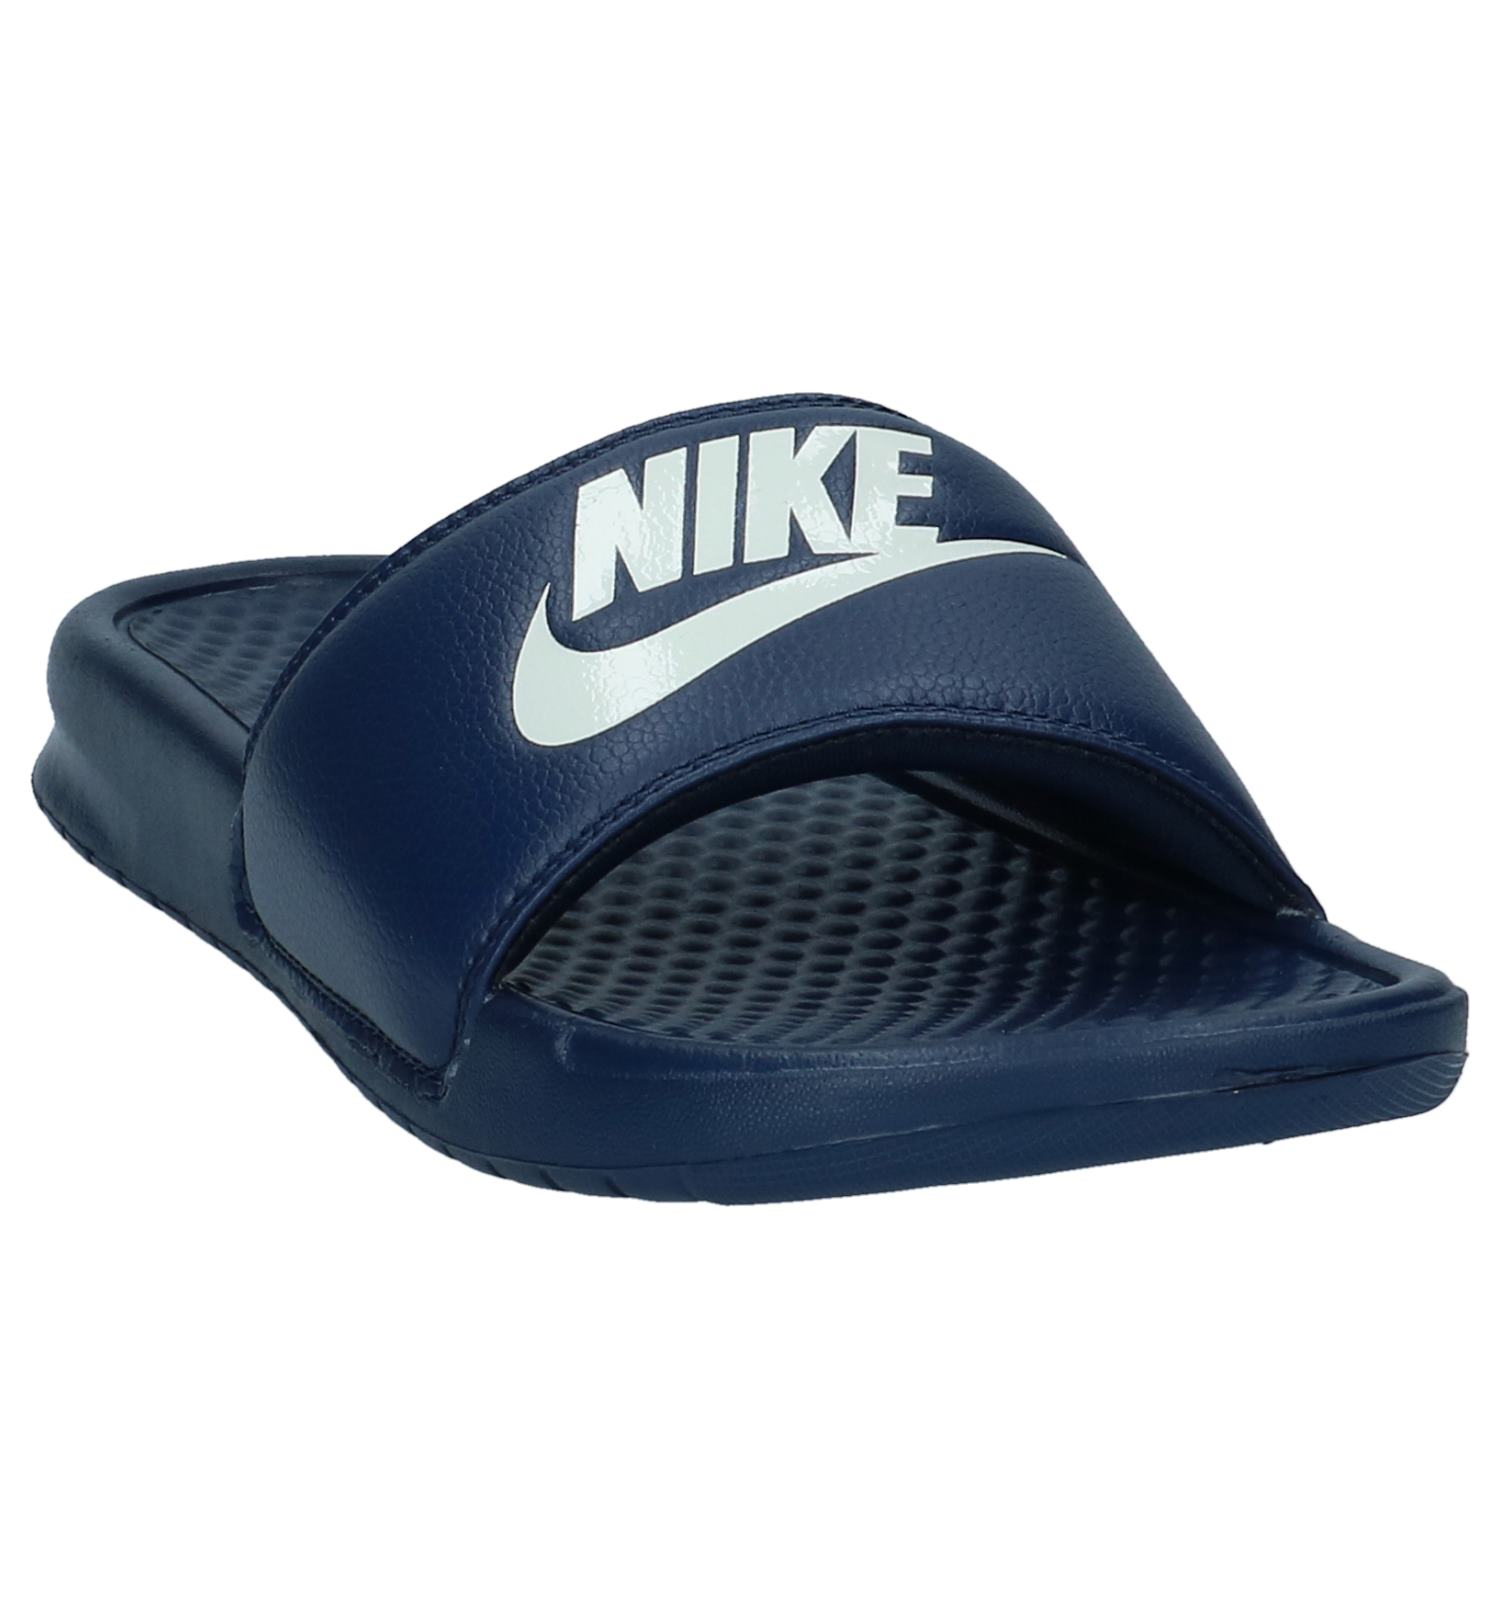 38201020972 Sportieve Slippers Donkerblauw Nike Benassi JDI | TORFS.BE | Gratis verzend  en retour